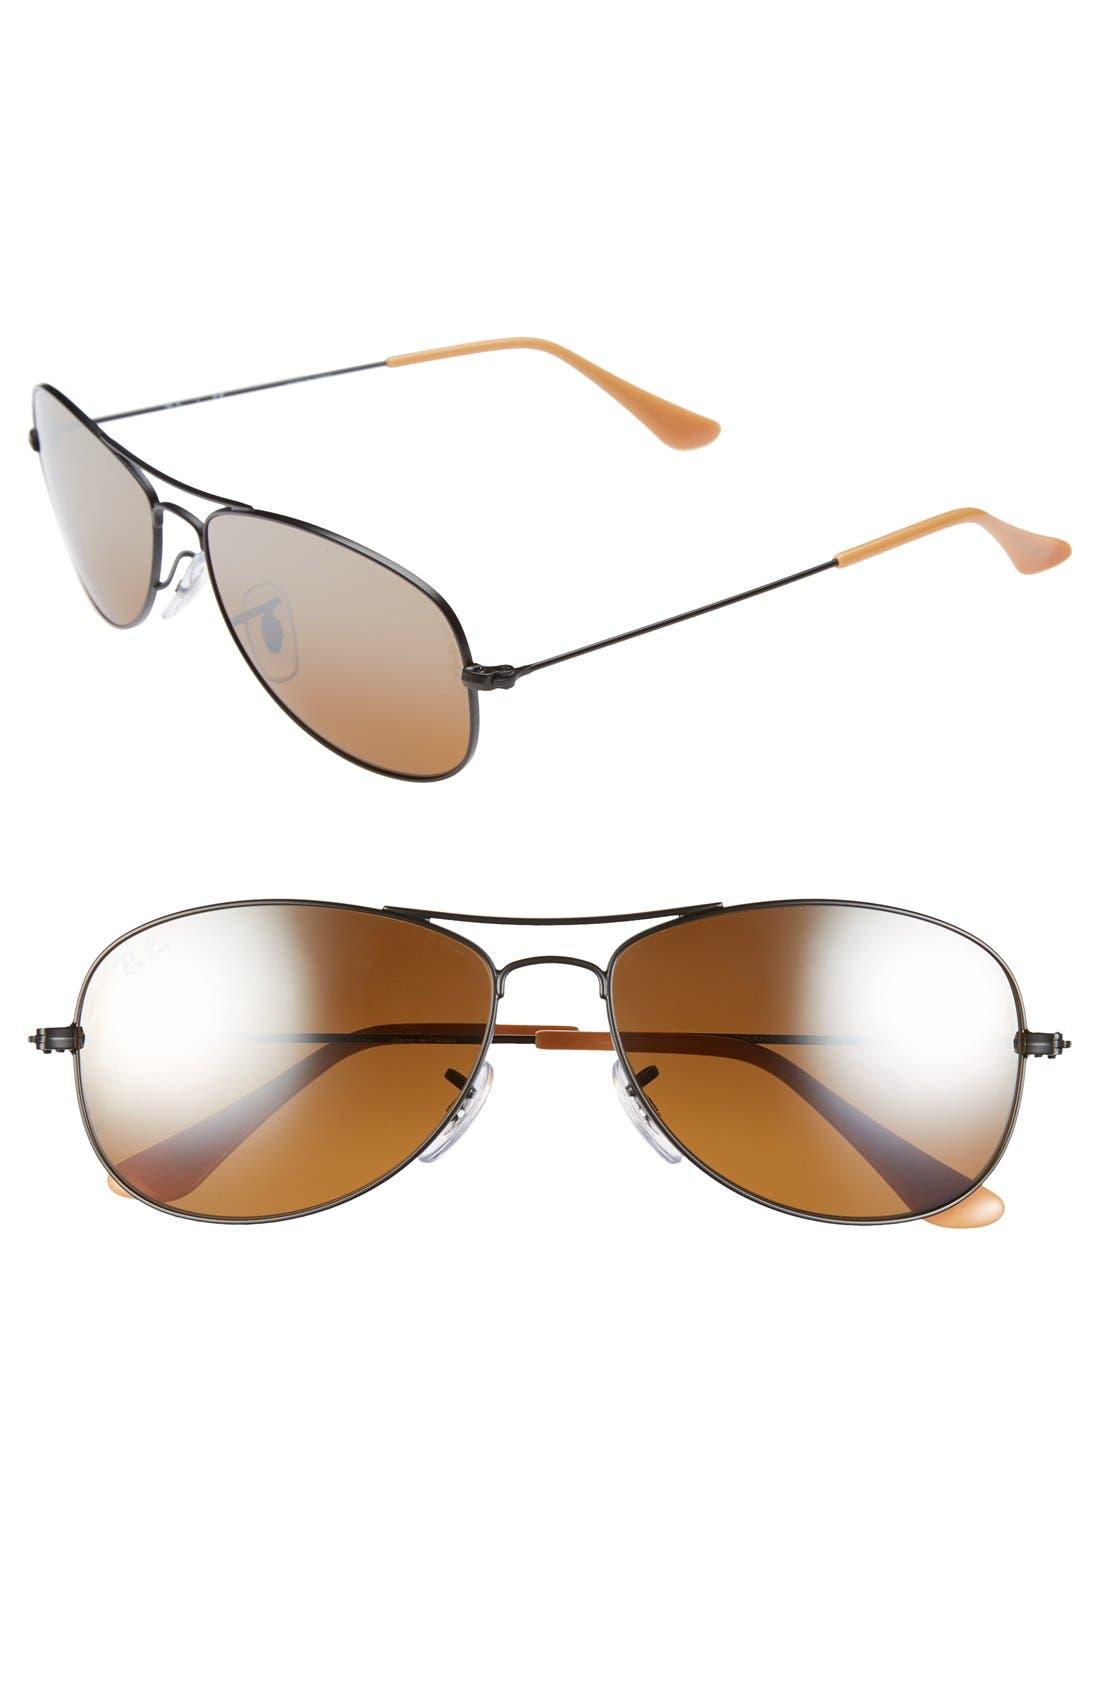 Alternate Image 1 Selected - Ray-Ban 'New Classic' 56mm Aviator Sunglasses